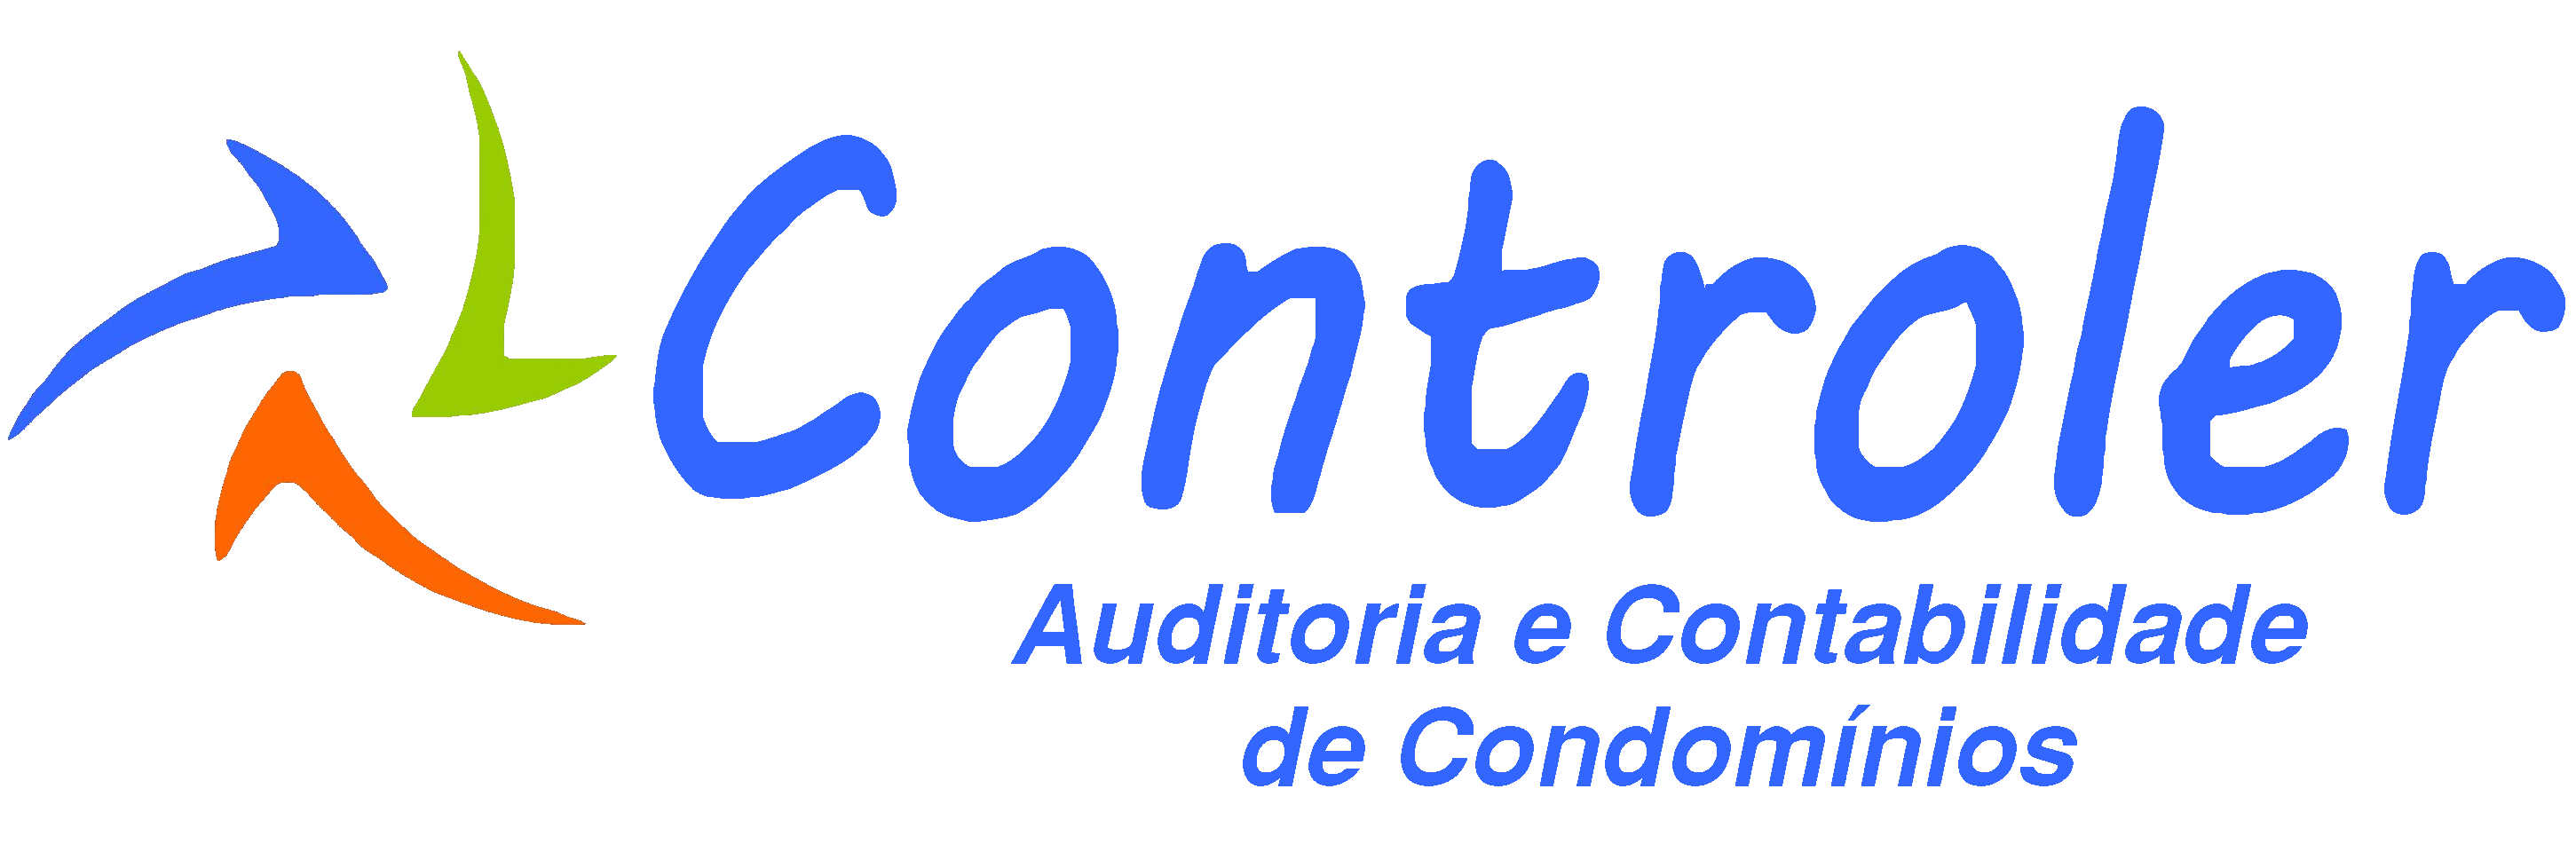 logo nova_vectorized1